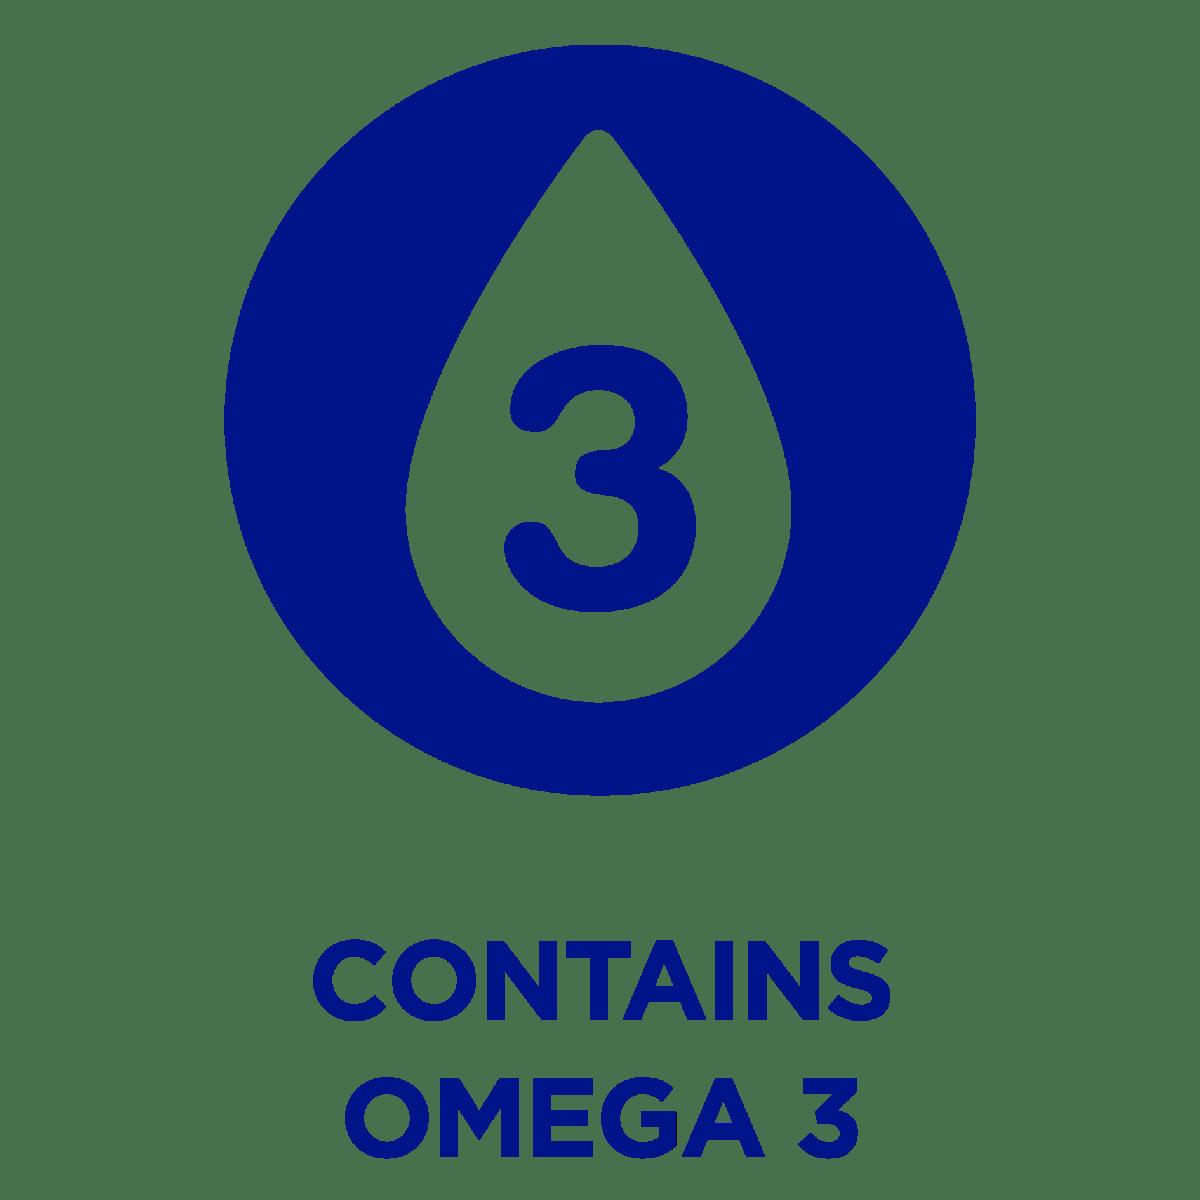 Contains Omega 3